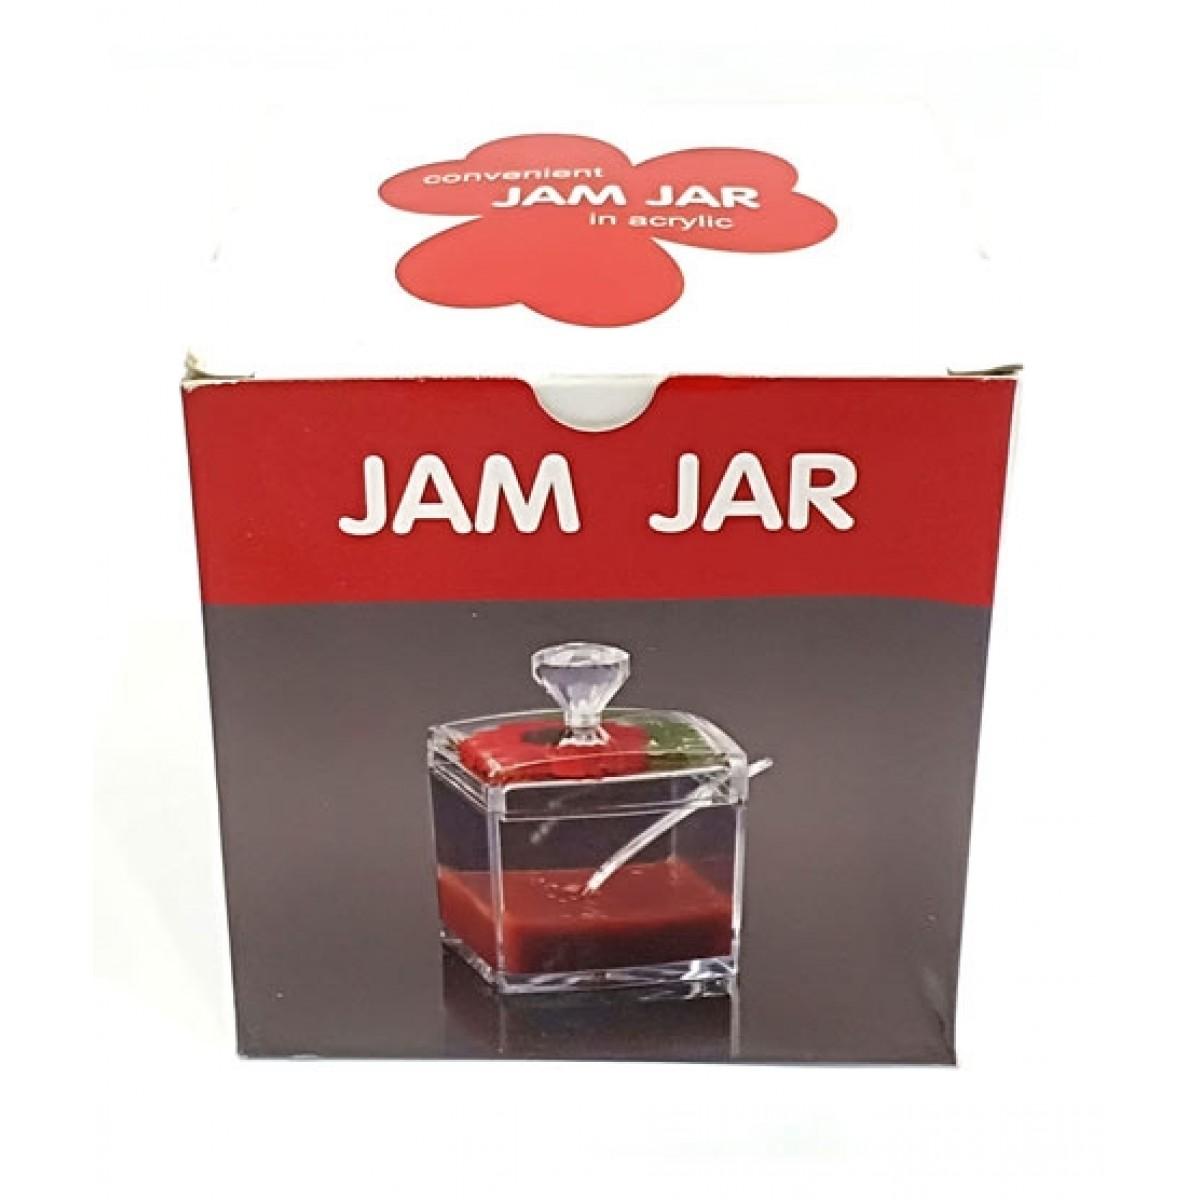 Quickshopping Acrylic Jam Jar With Spoon